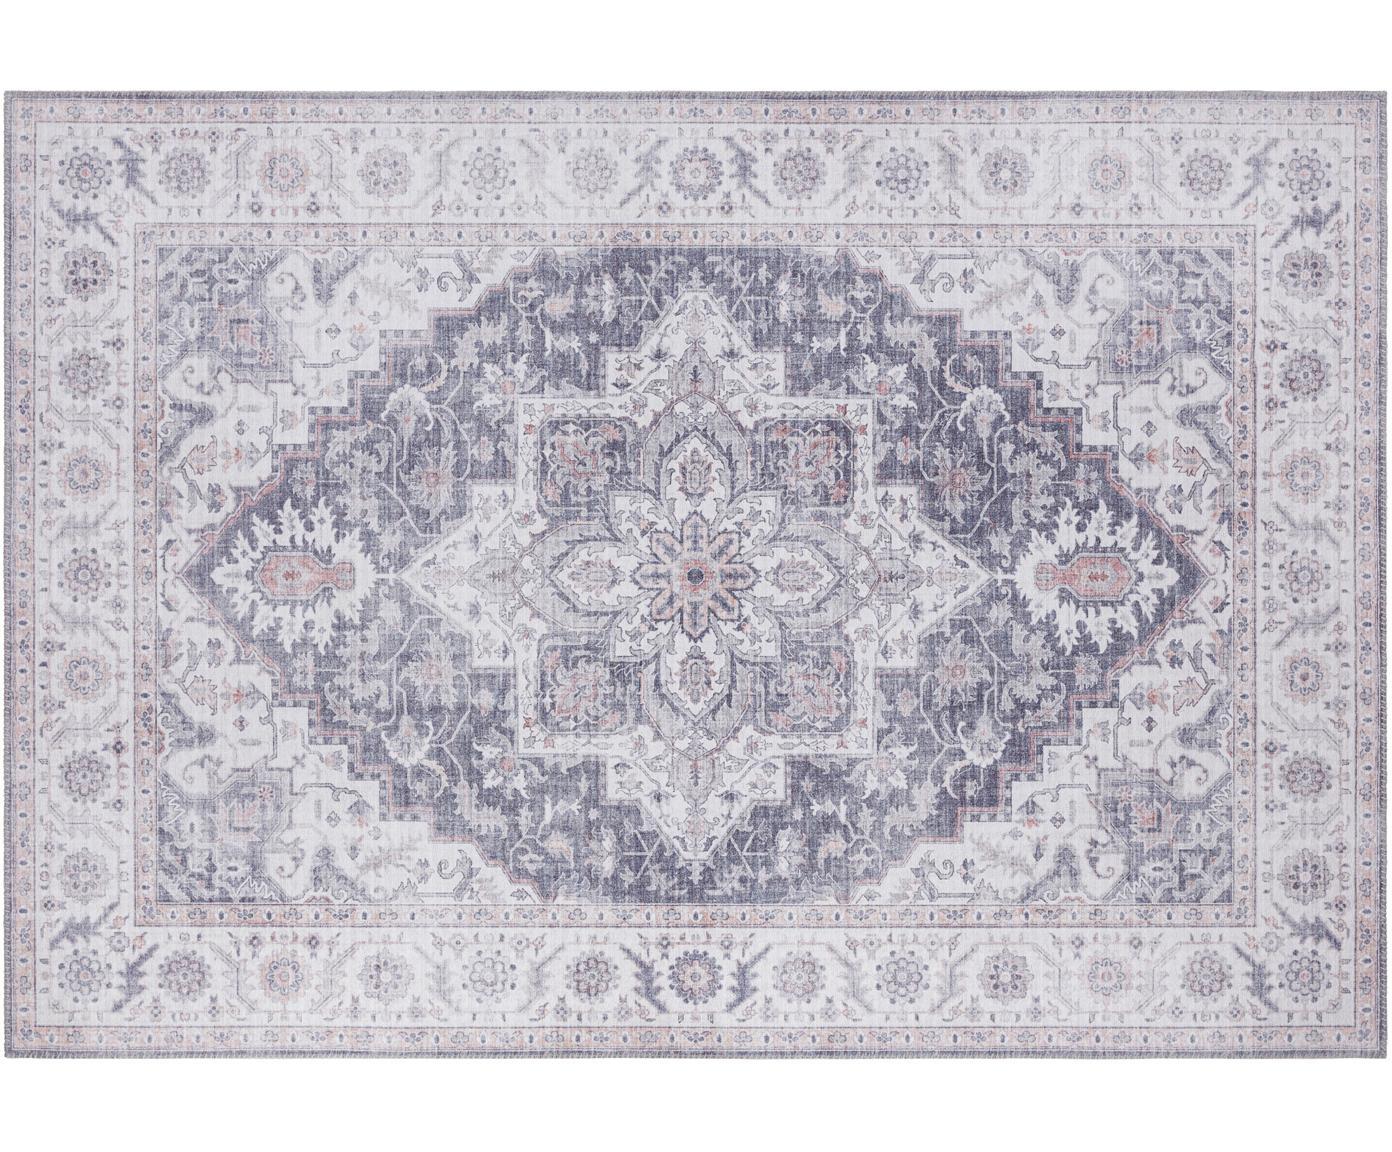 Teppich Anthea im Vintage Style, Blau-Grau, Mauve, B 80 x L 150 cm (Größe XS)